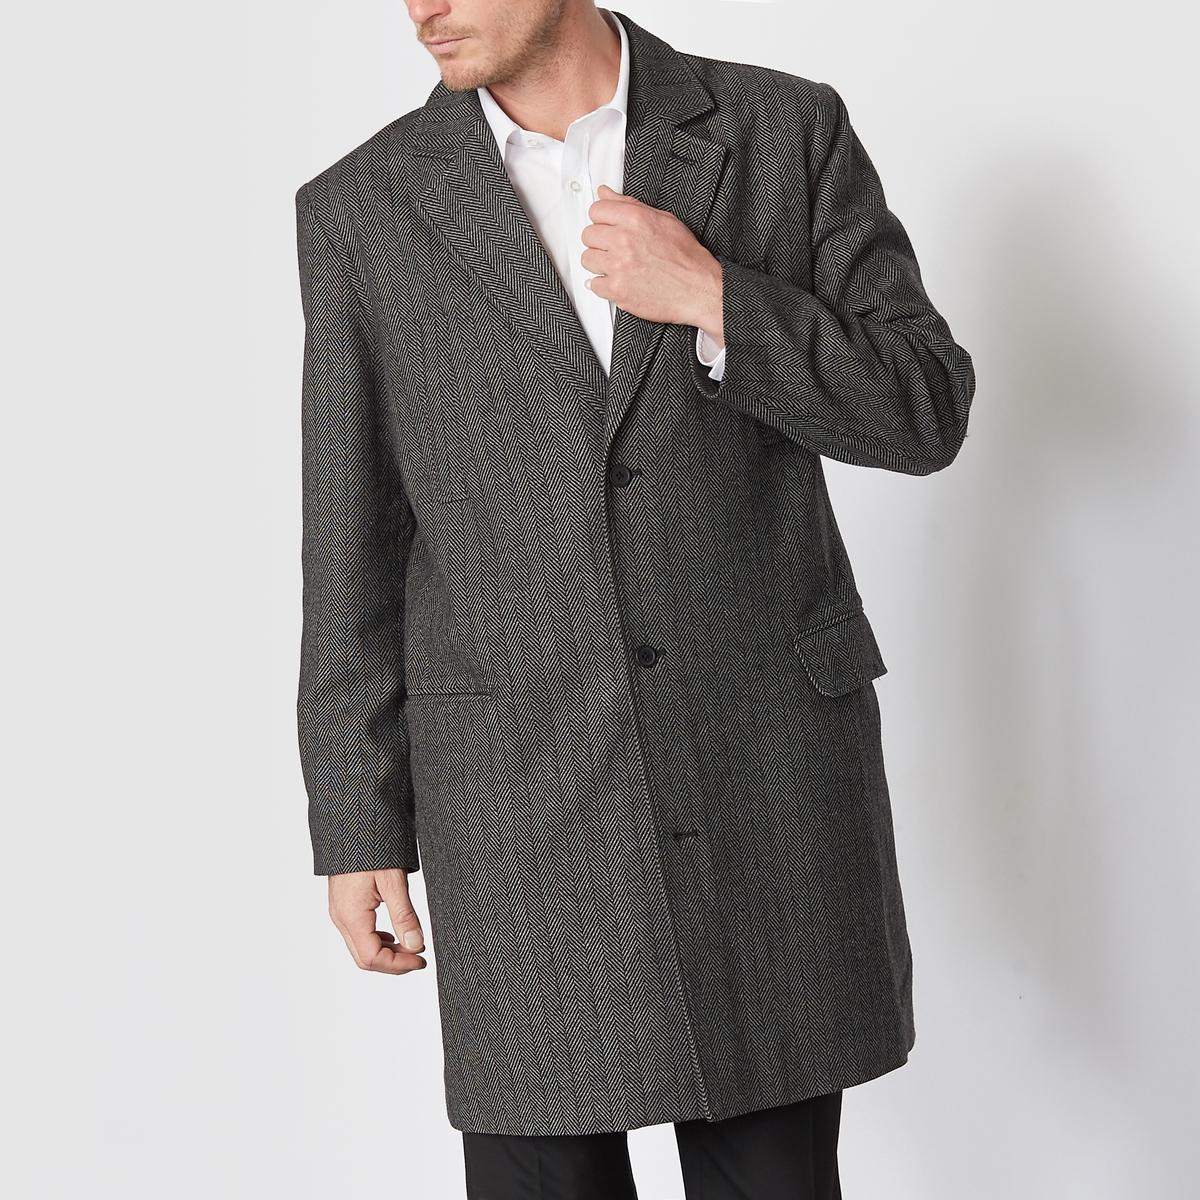 Пальто твидовое с рукавами ¾, с узором шеврон от La Redoute